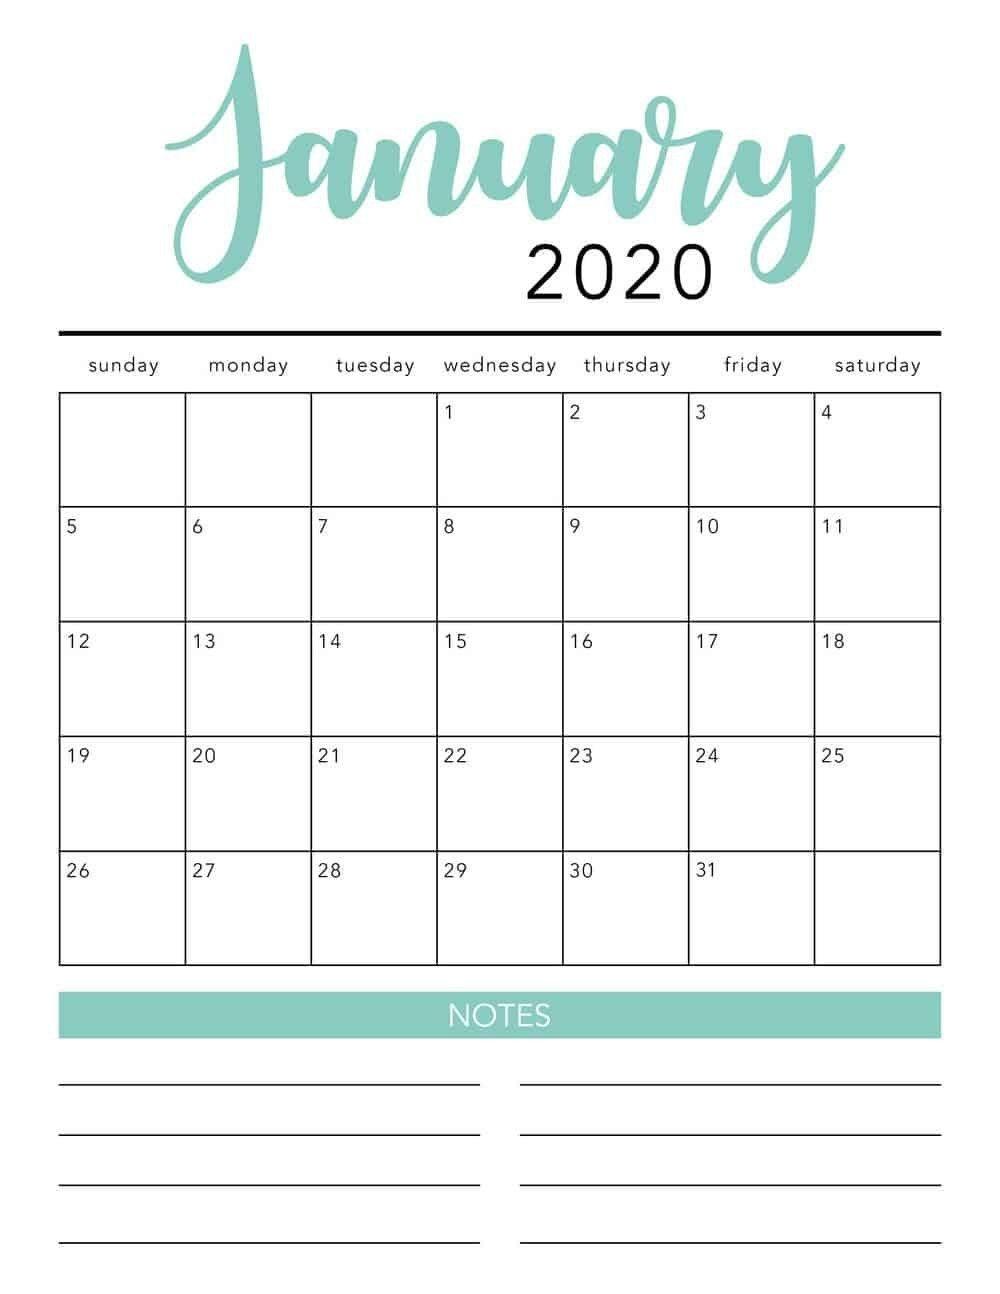 Free 2020 Monthly Calendar Printable   Free Printable  Free Printable 2020 Monthly Calendar